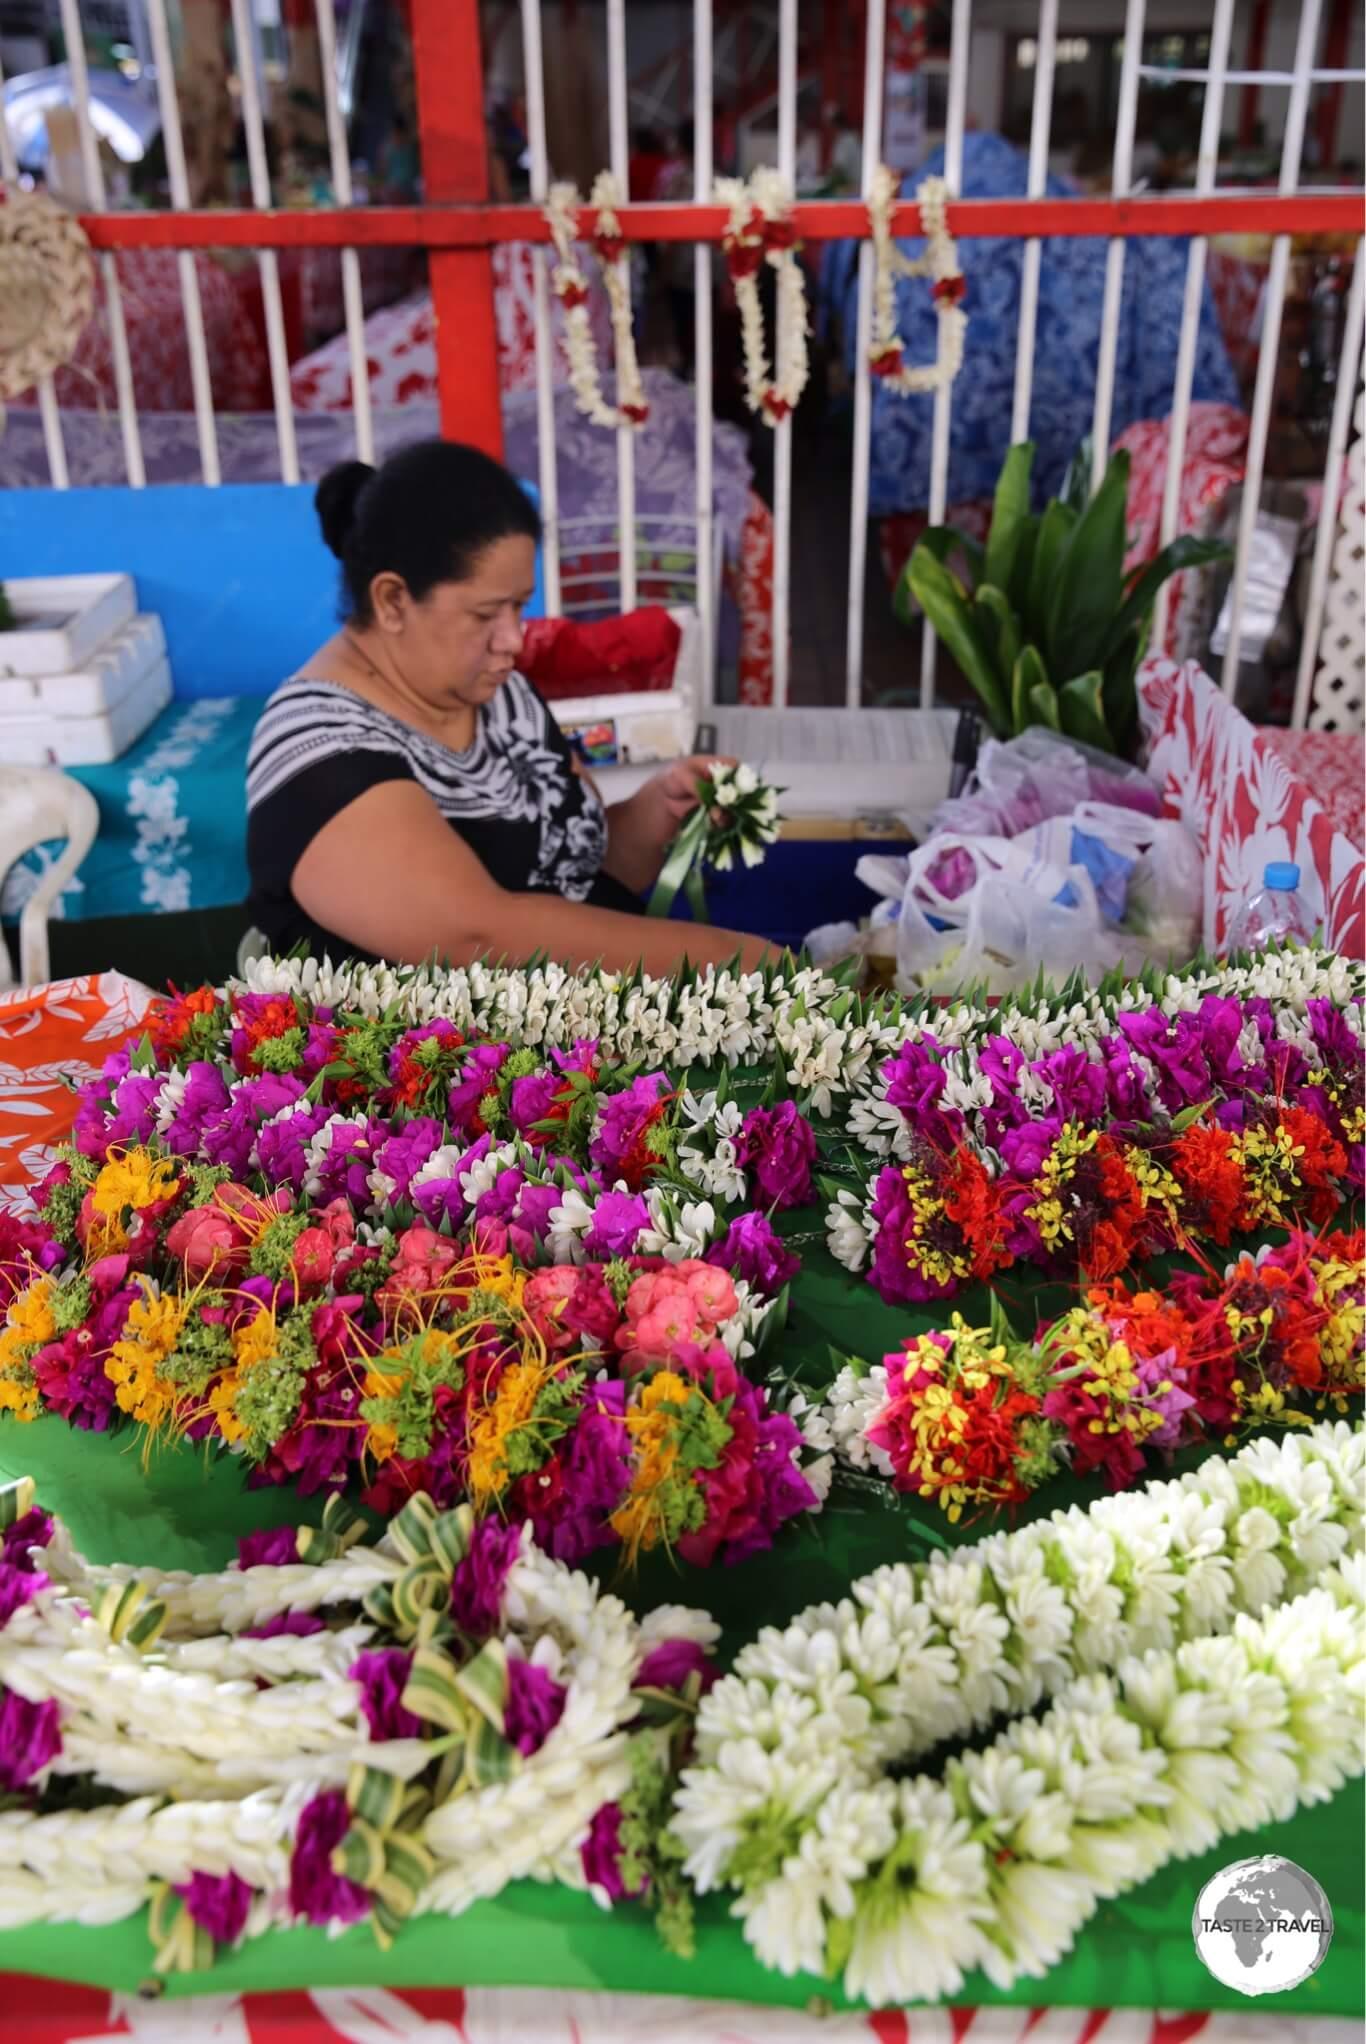 Flower seller at Papeete Central Market.